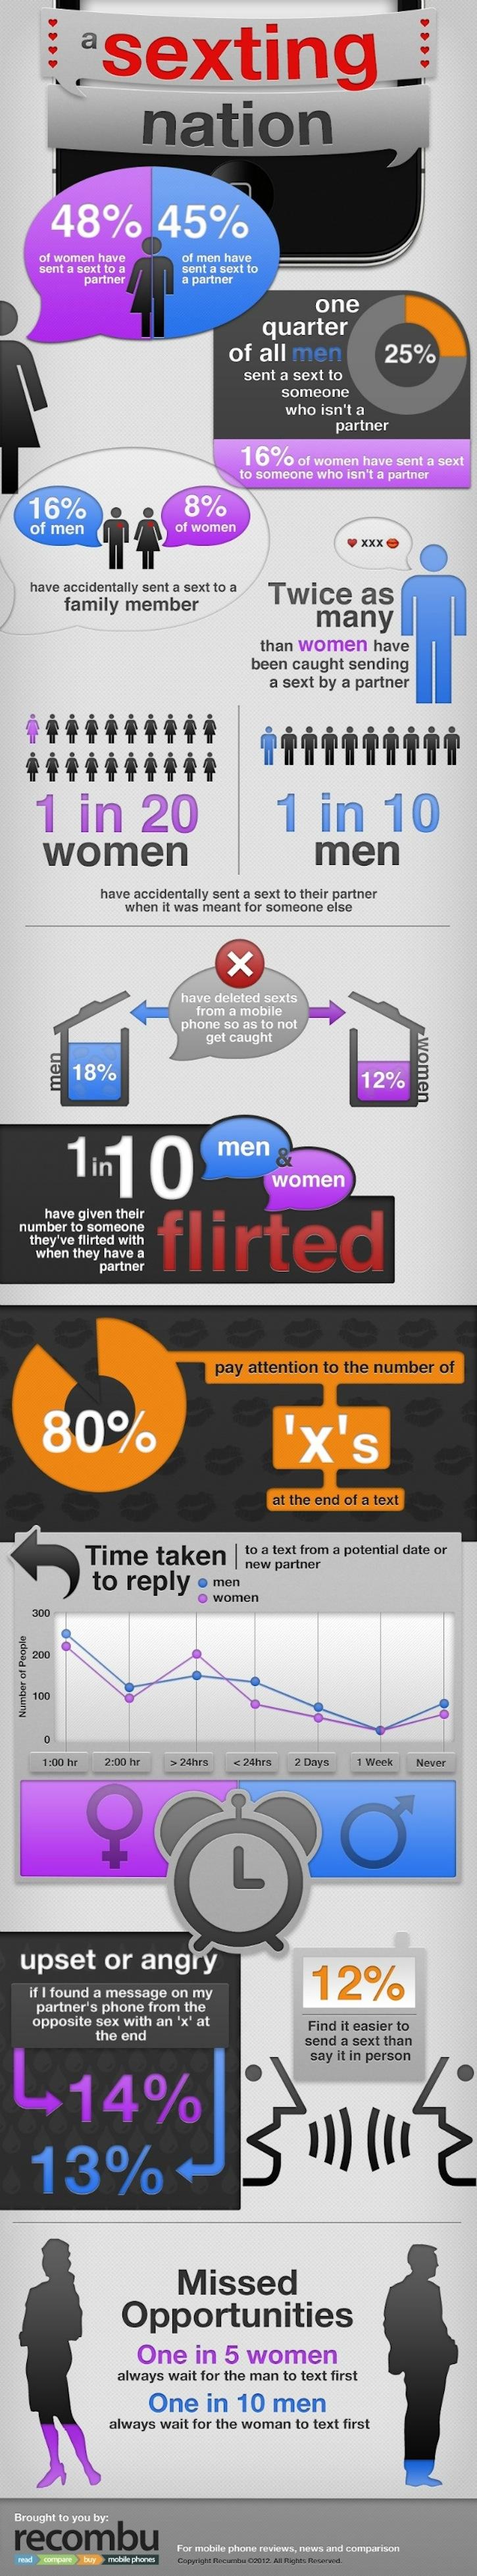 Sexting Statistics Infographic